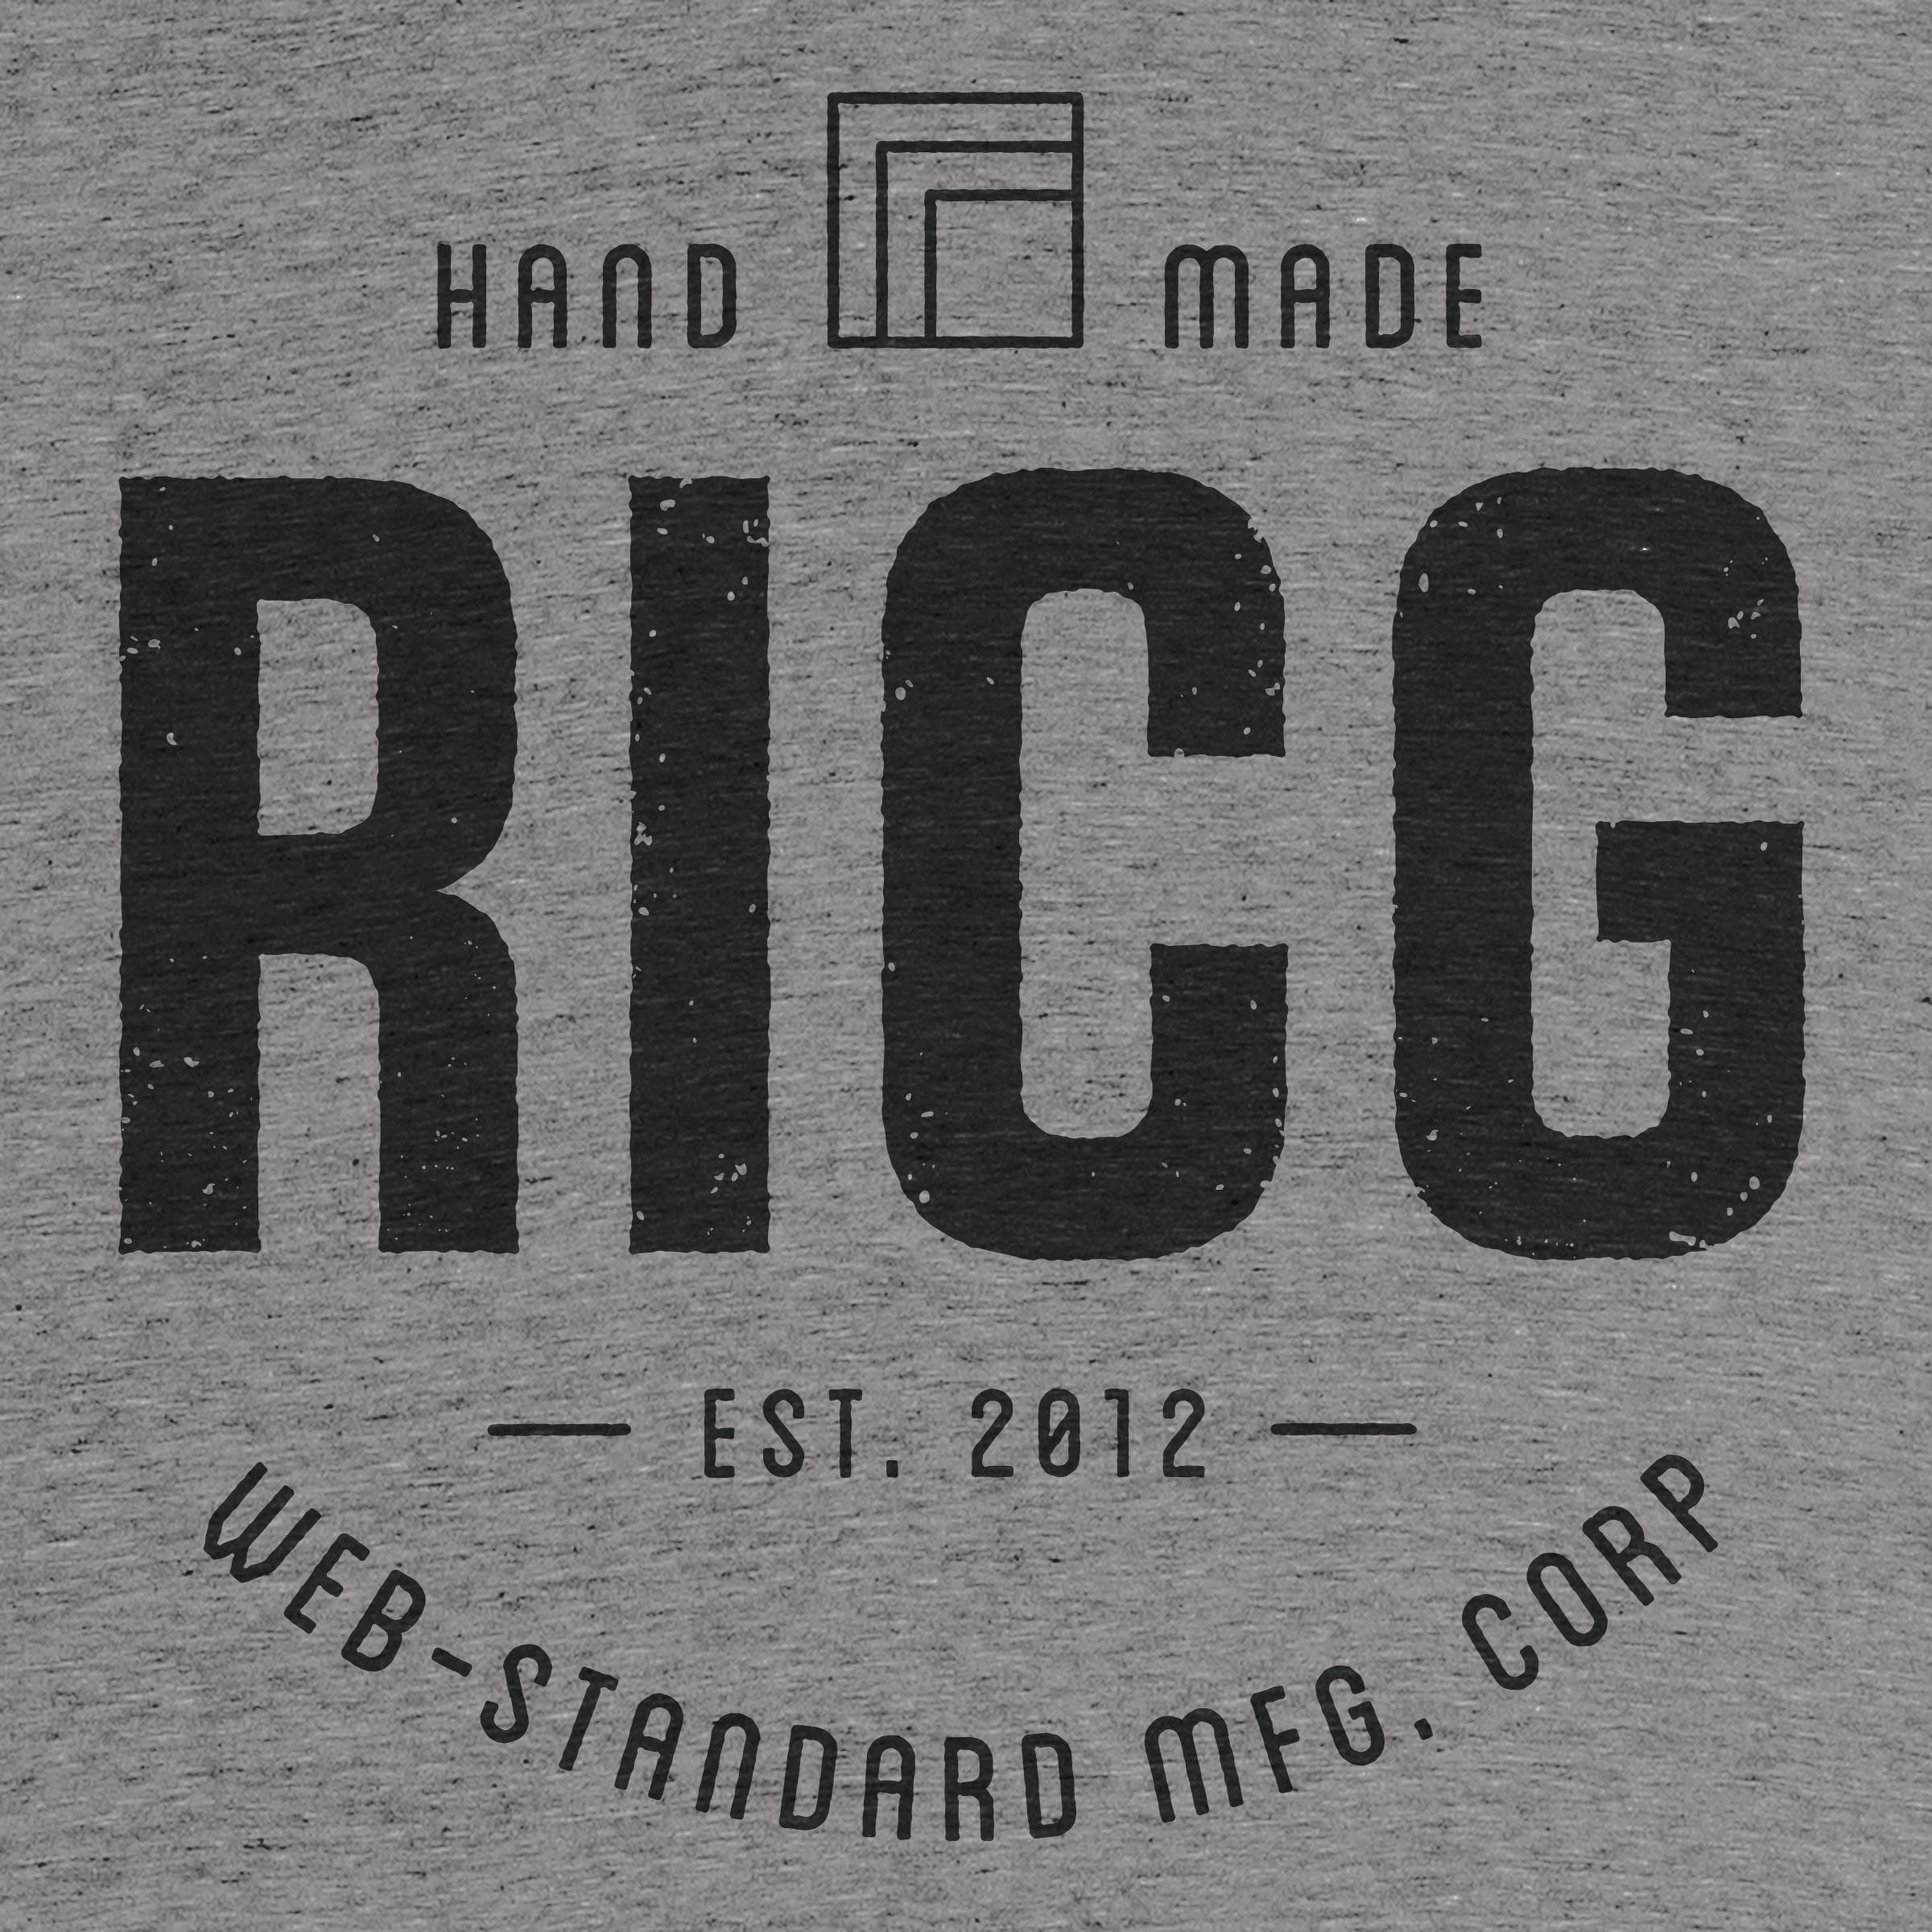 RICG Web-Standard Mfg. Corp